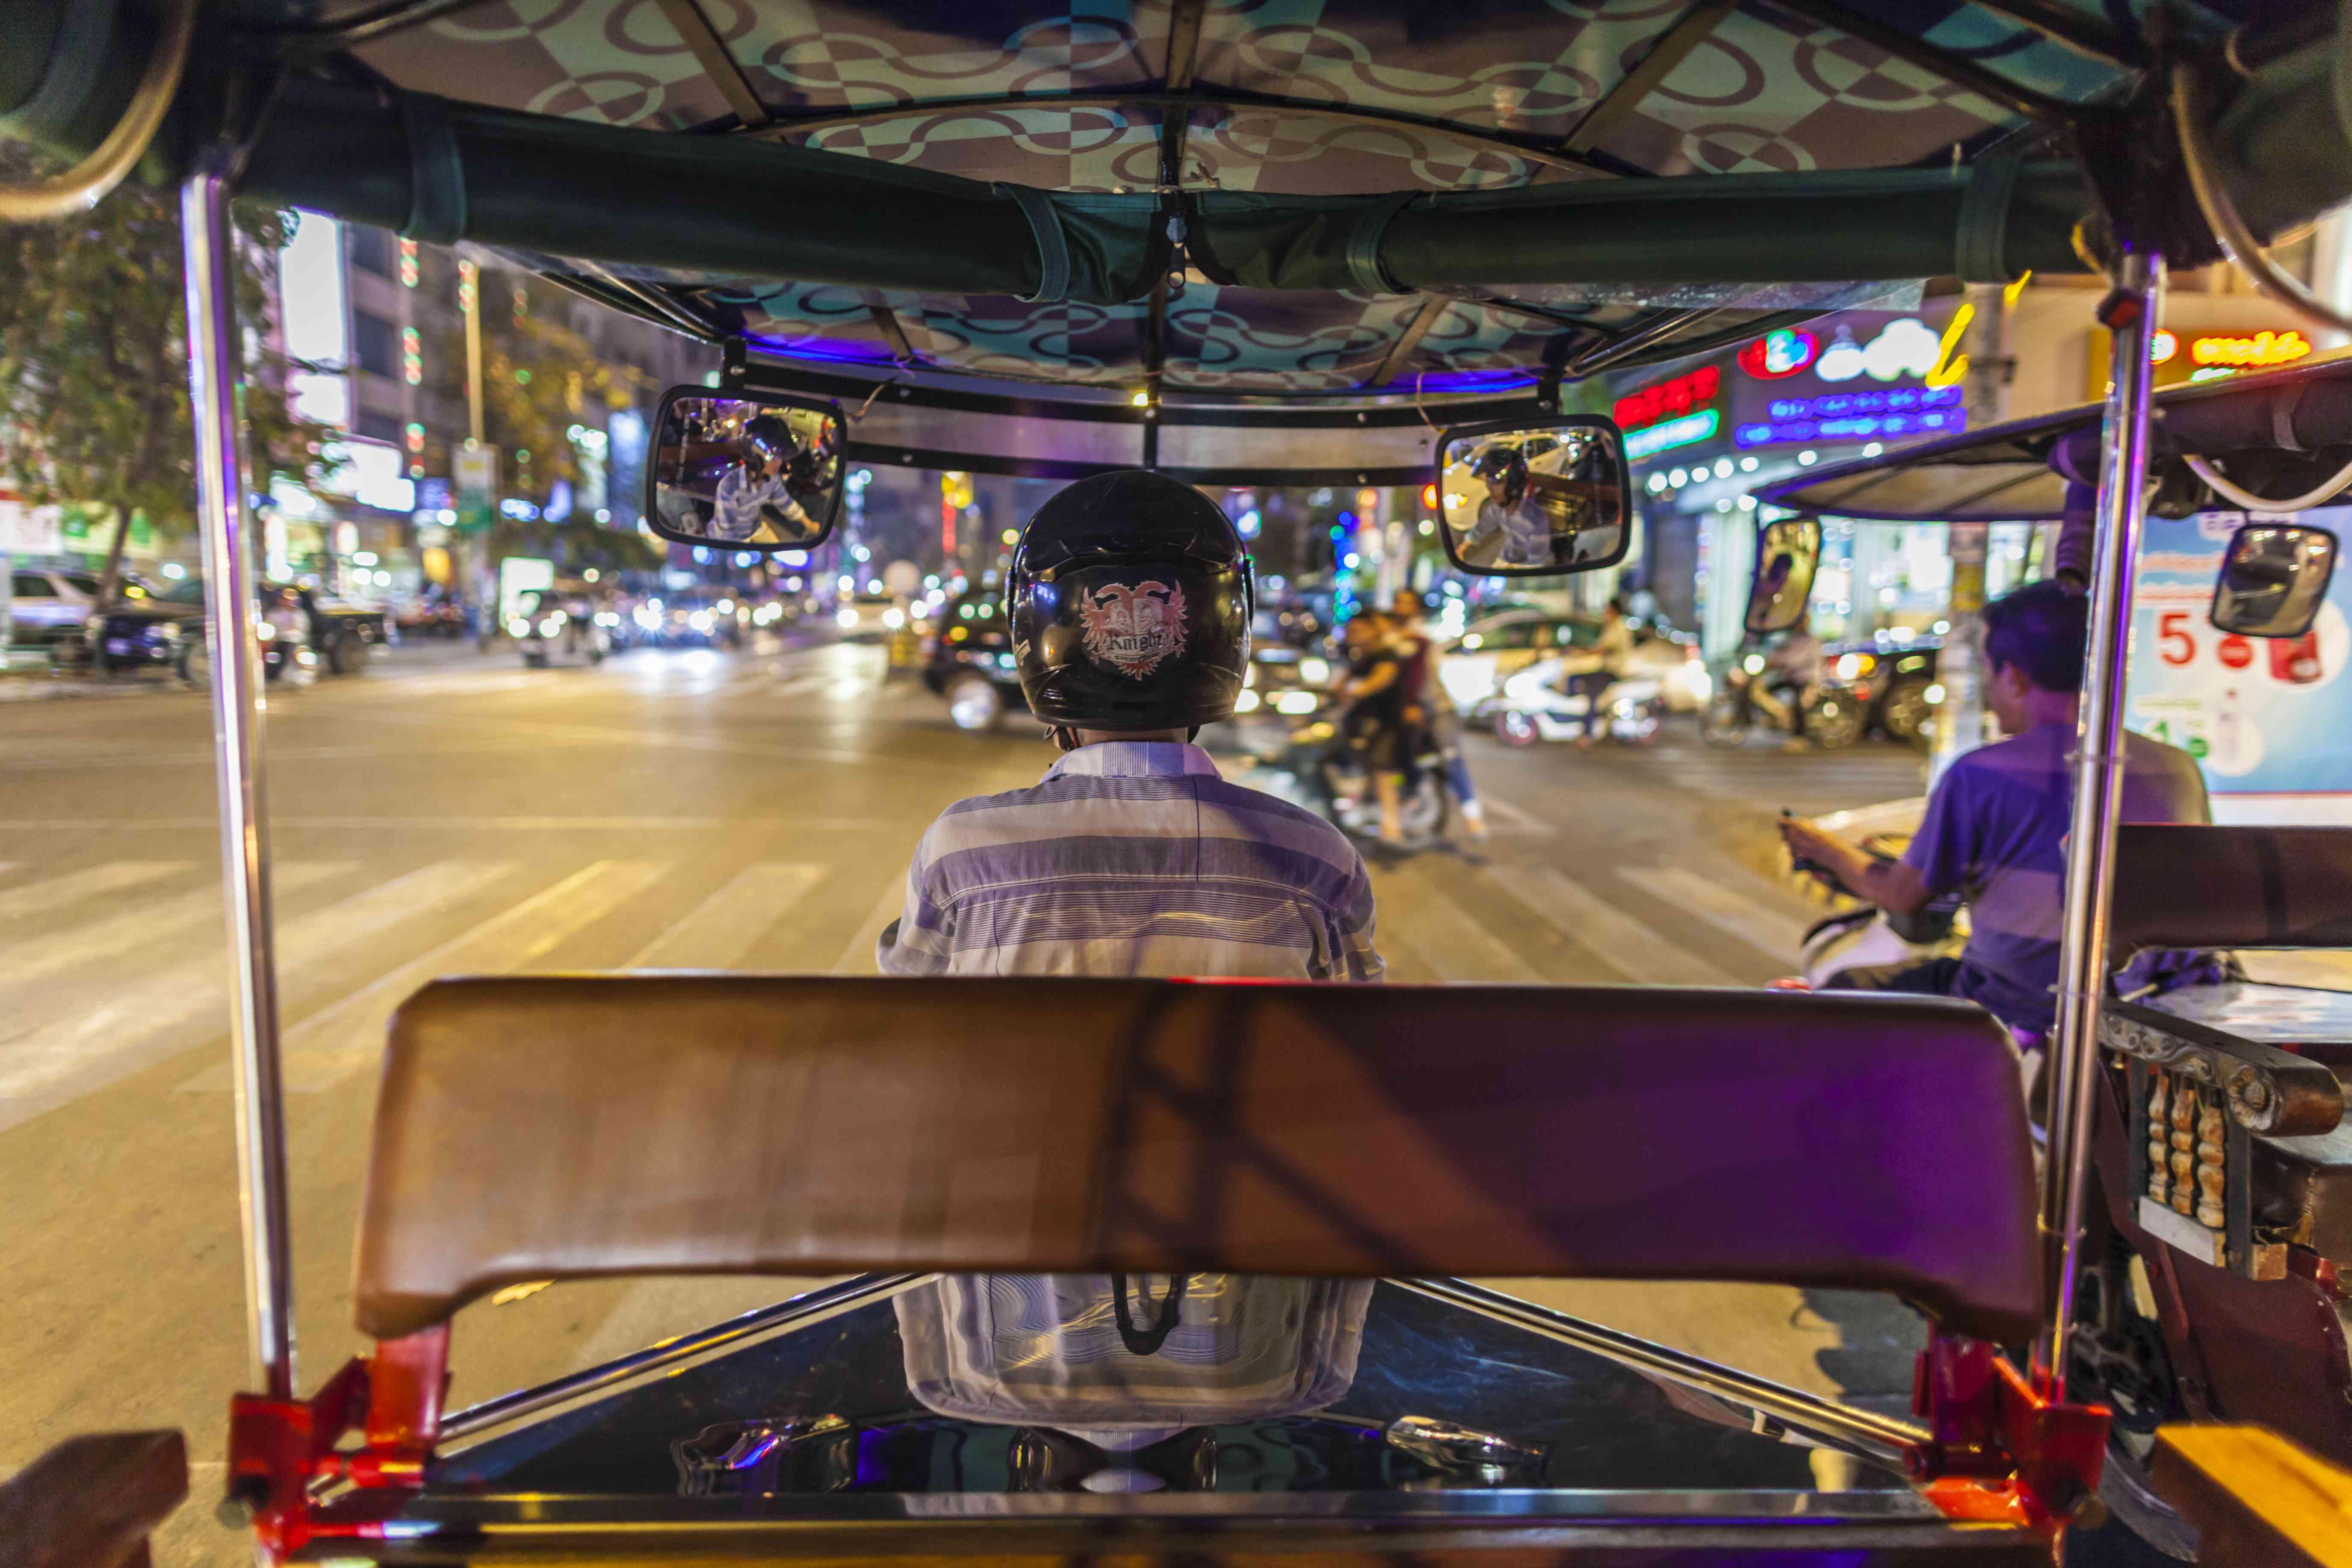 A tuk-tuk ride in Phnom Penh at night